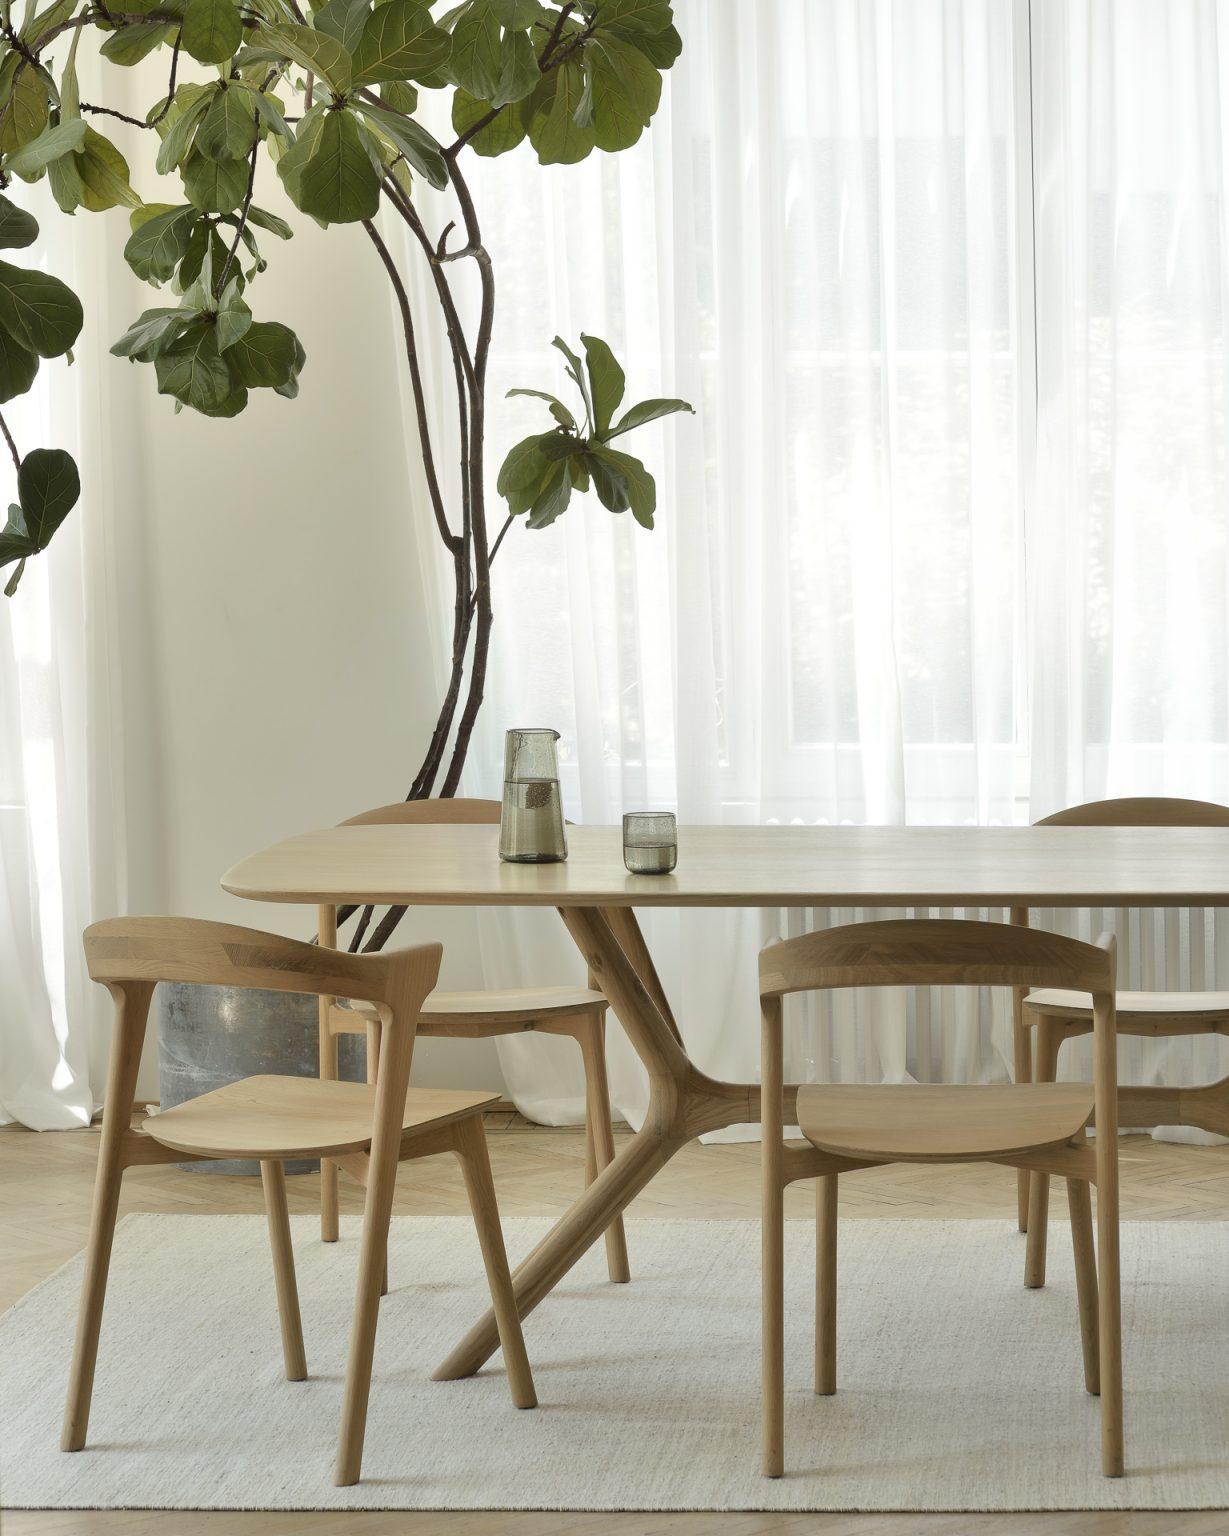 Biennale Interieur - Belgium's leading design and interior event - 50028_oak_x_dining_table_51490_oak_bok_chair_21700_nomad_sand_rug_3_web.jpg